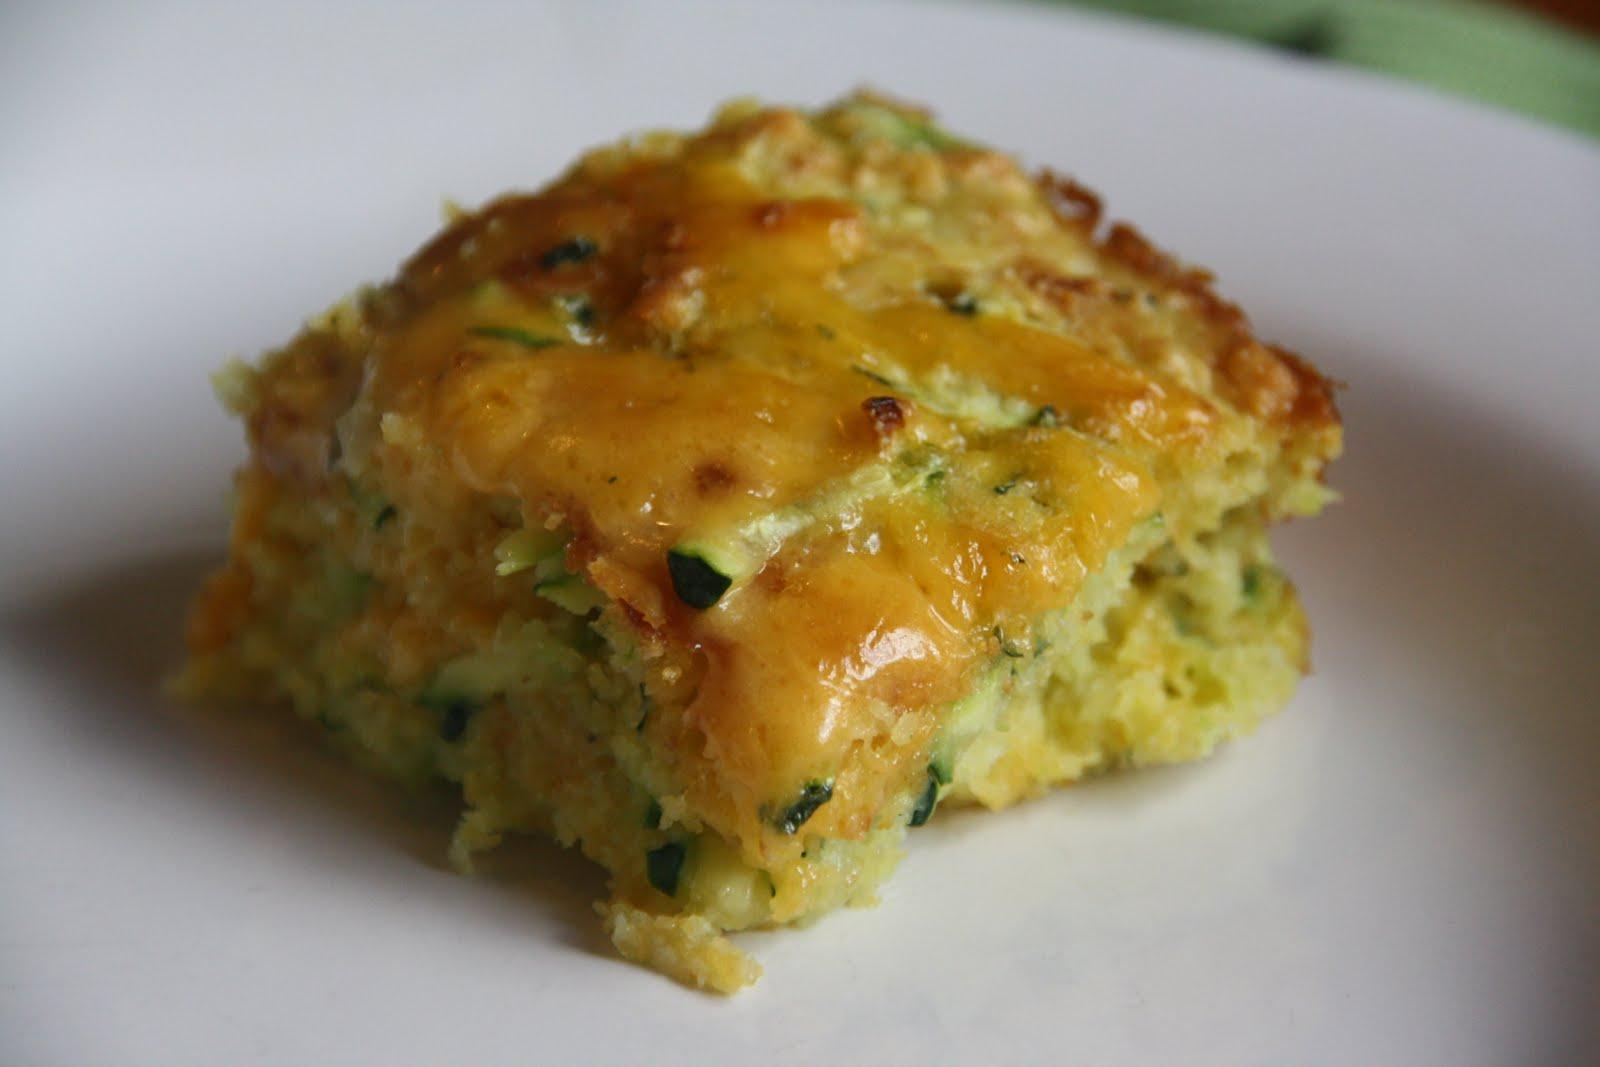 Making house a home: Zucchini Cornbread Casserole